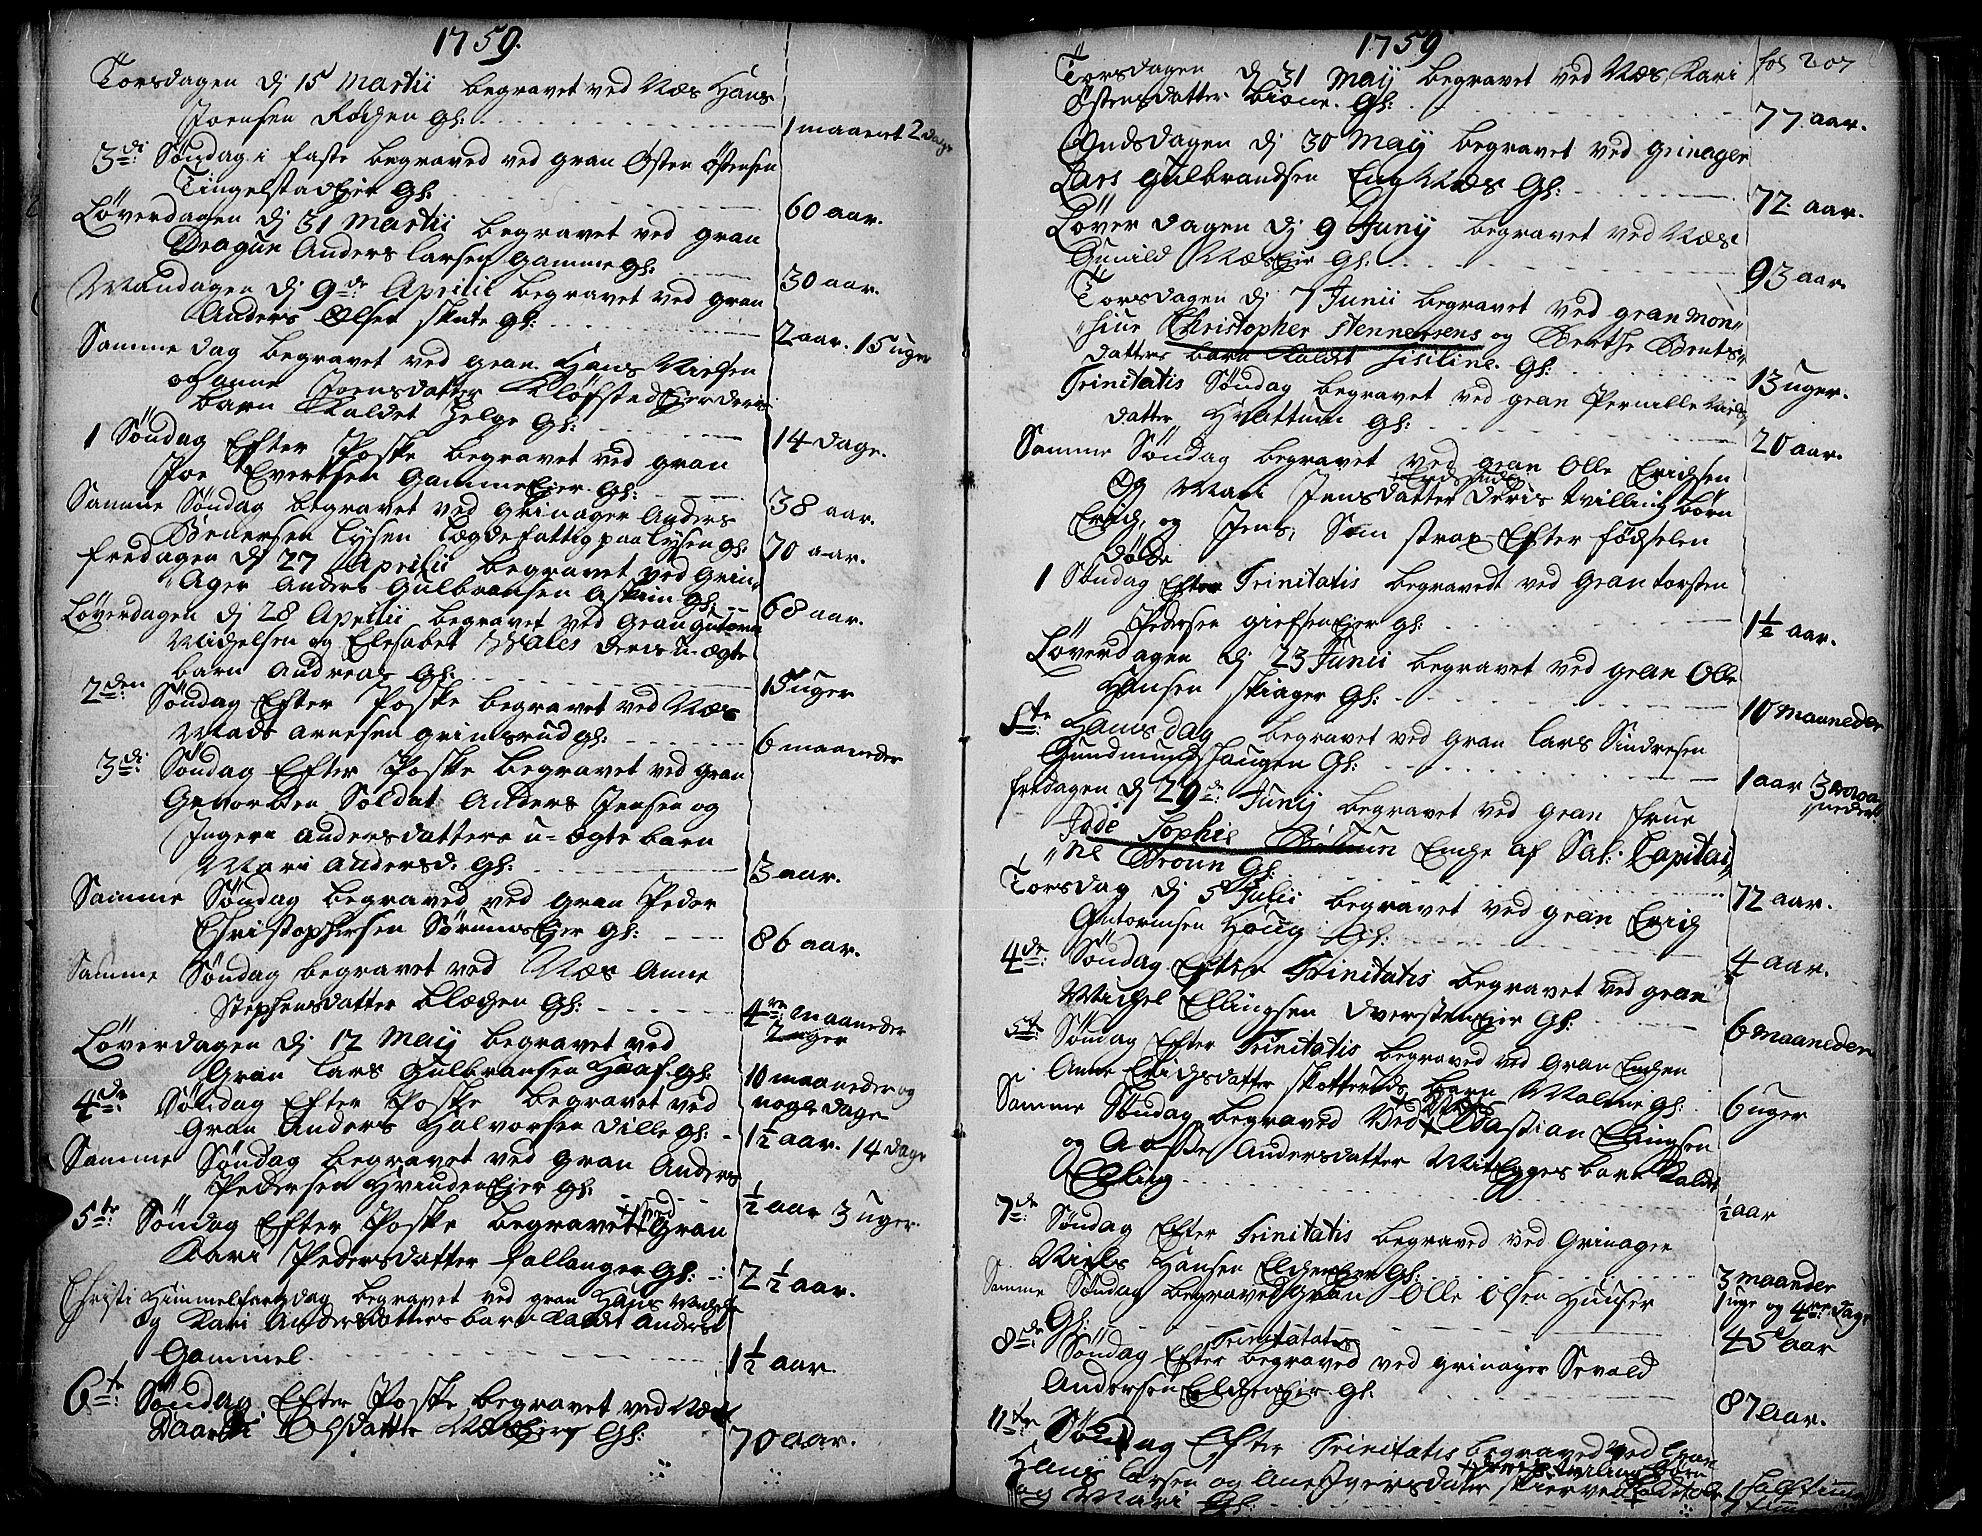 SAH, Gran prestekontor, Ministerialbok nr. 4, 1759-1775, s. 207